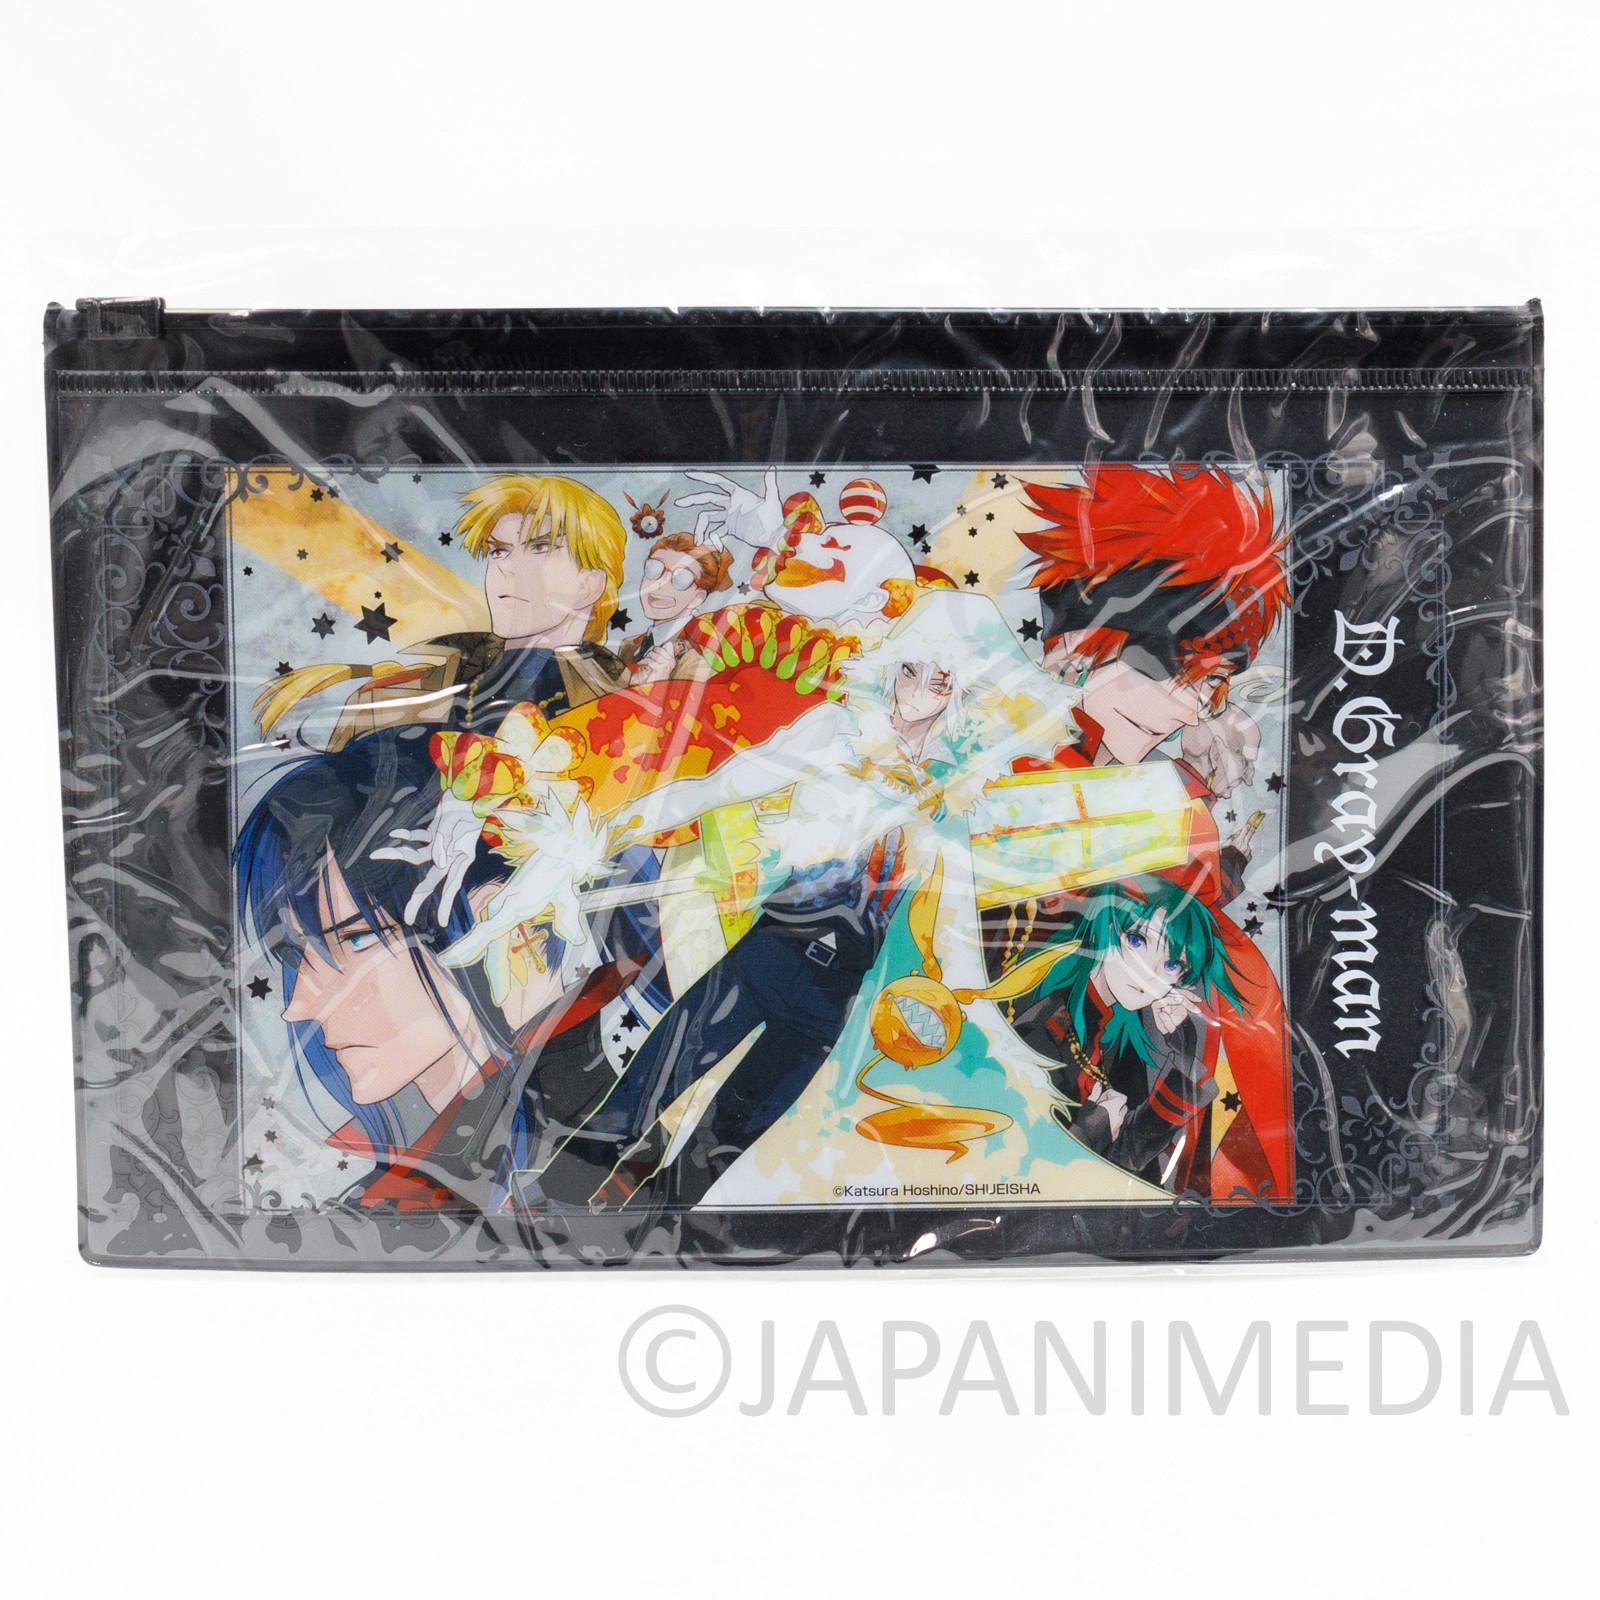 D.Gray-man Vinyl Pouch Shonen Jump Exhibition JAPAN ANIME MANGA